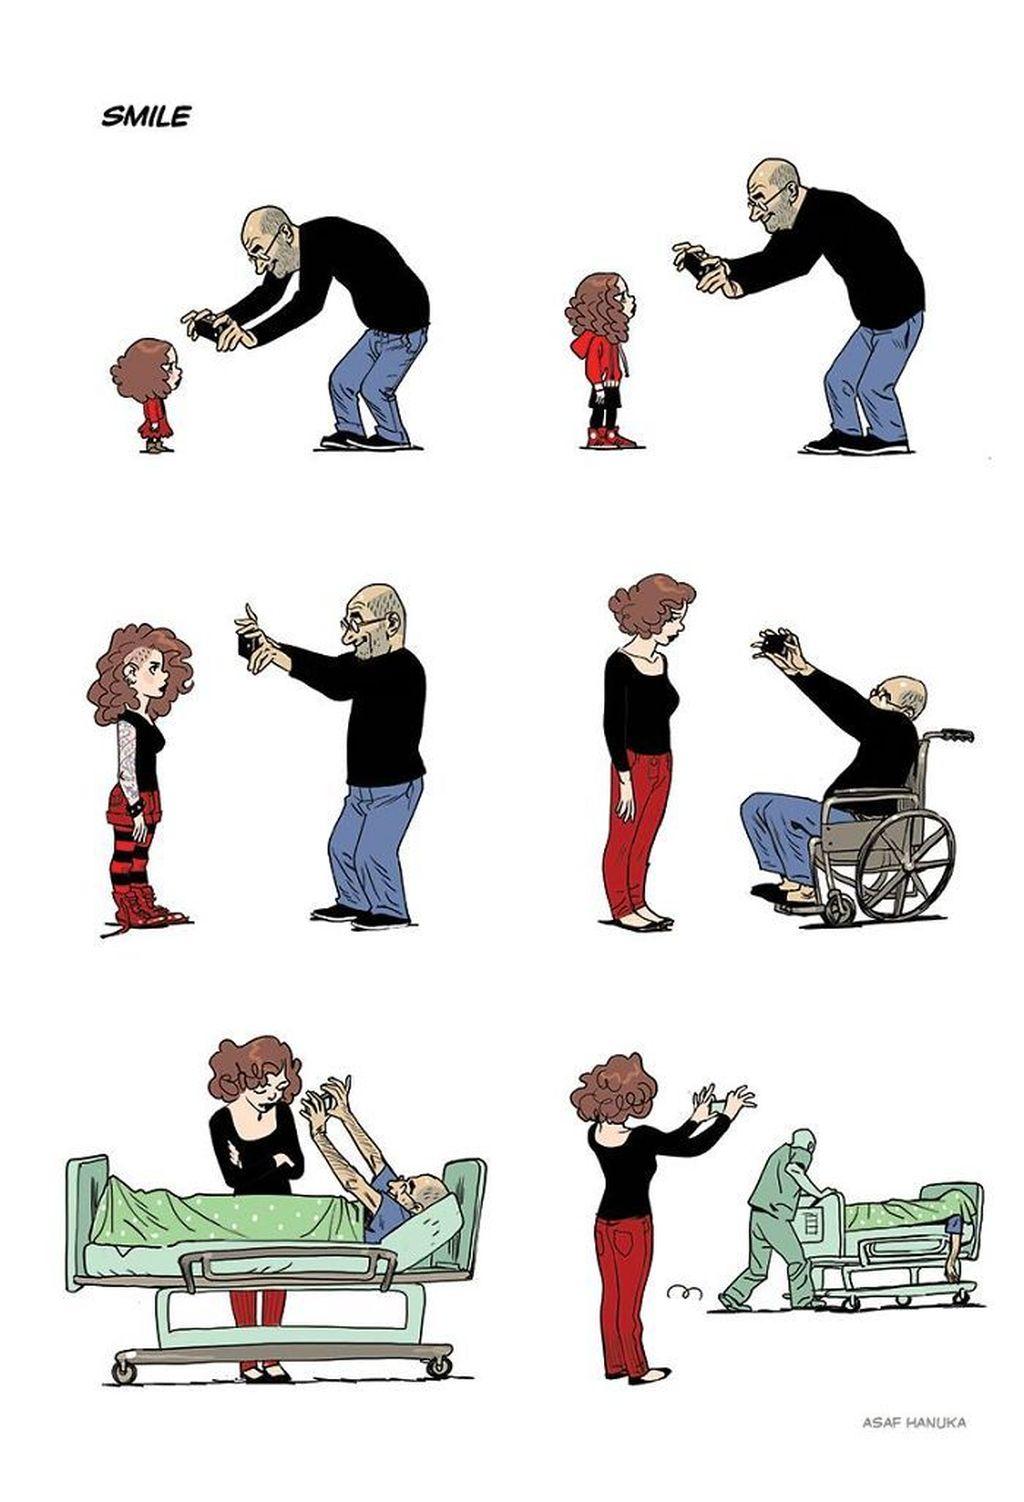 Gambar ini menceritakan dari wanita ini masih kecil hingga dewasa, sang ayah selalu memotretnya dengan sebuah ponsel. Sampai akhirnya ayahnya meninggal, si anak pun gantian yang memotret. (Foto: Asaf Hanuka)